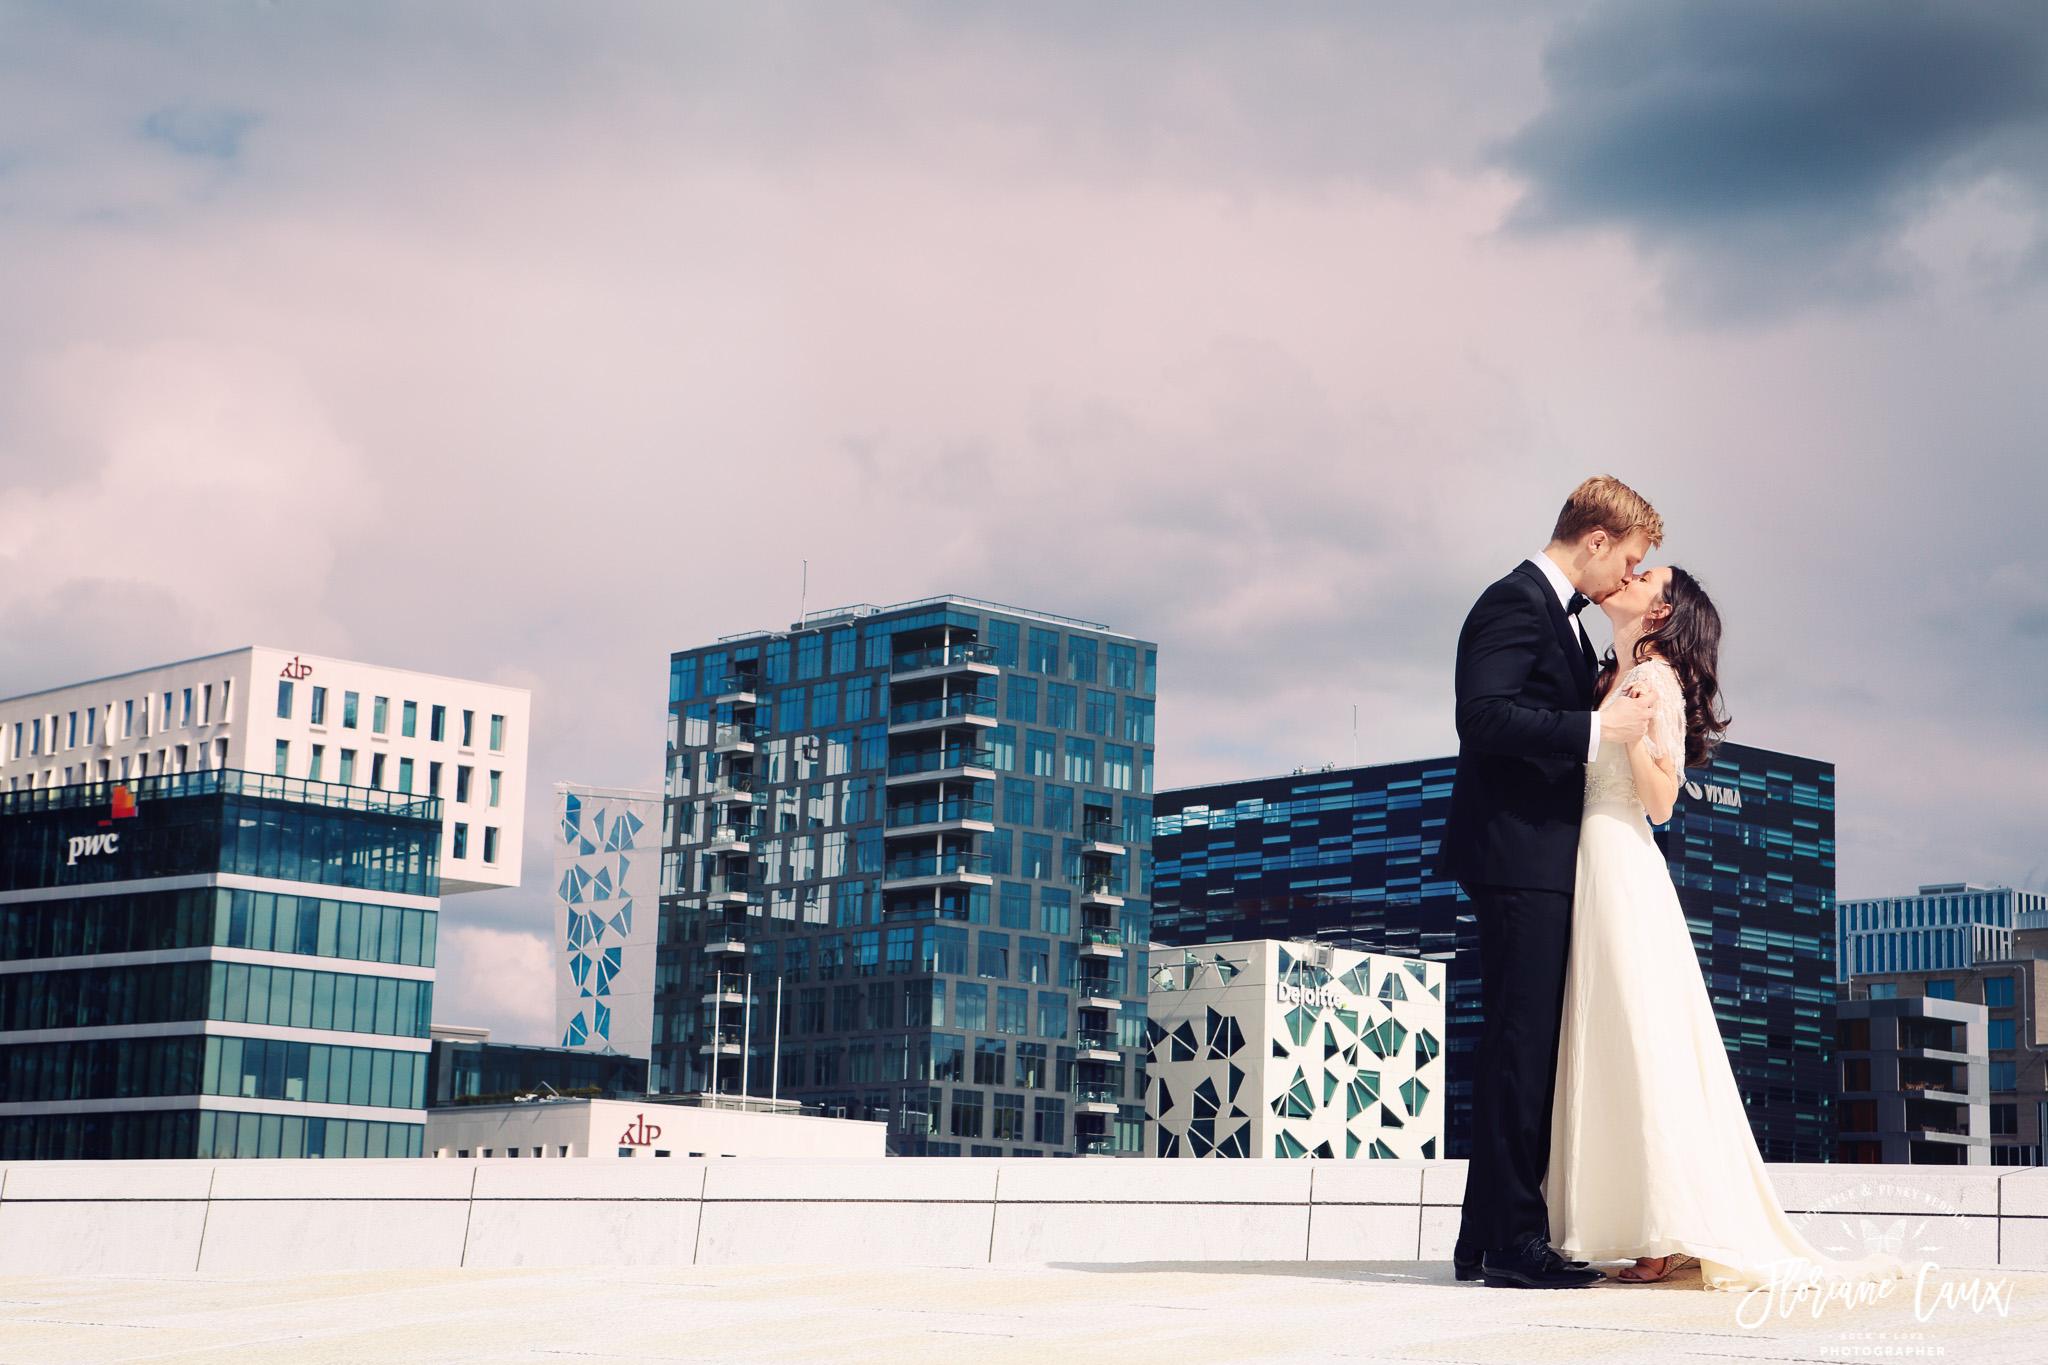 destination-wedding-photographer-oslo-norway-floriane-caux-70